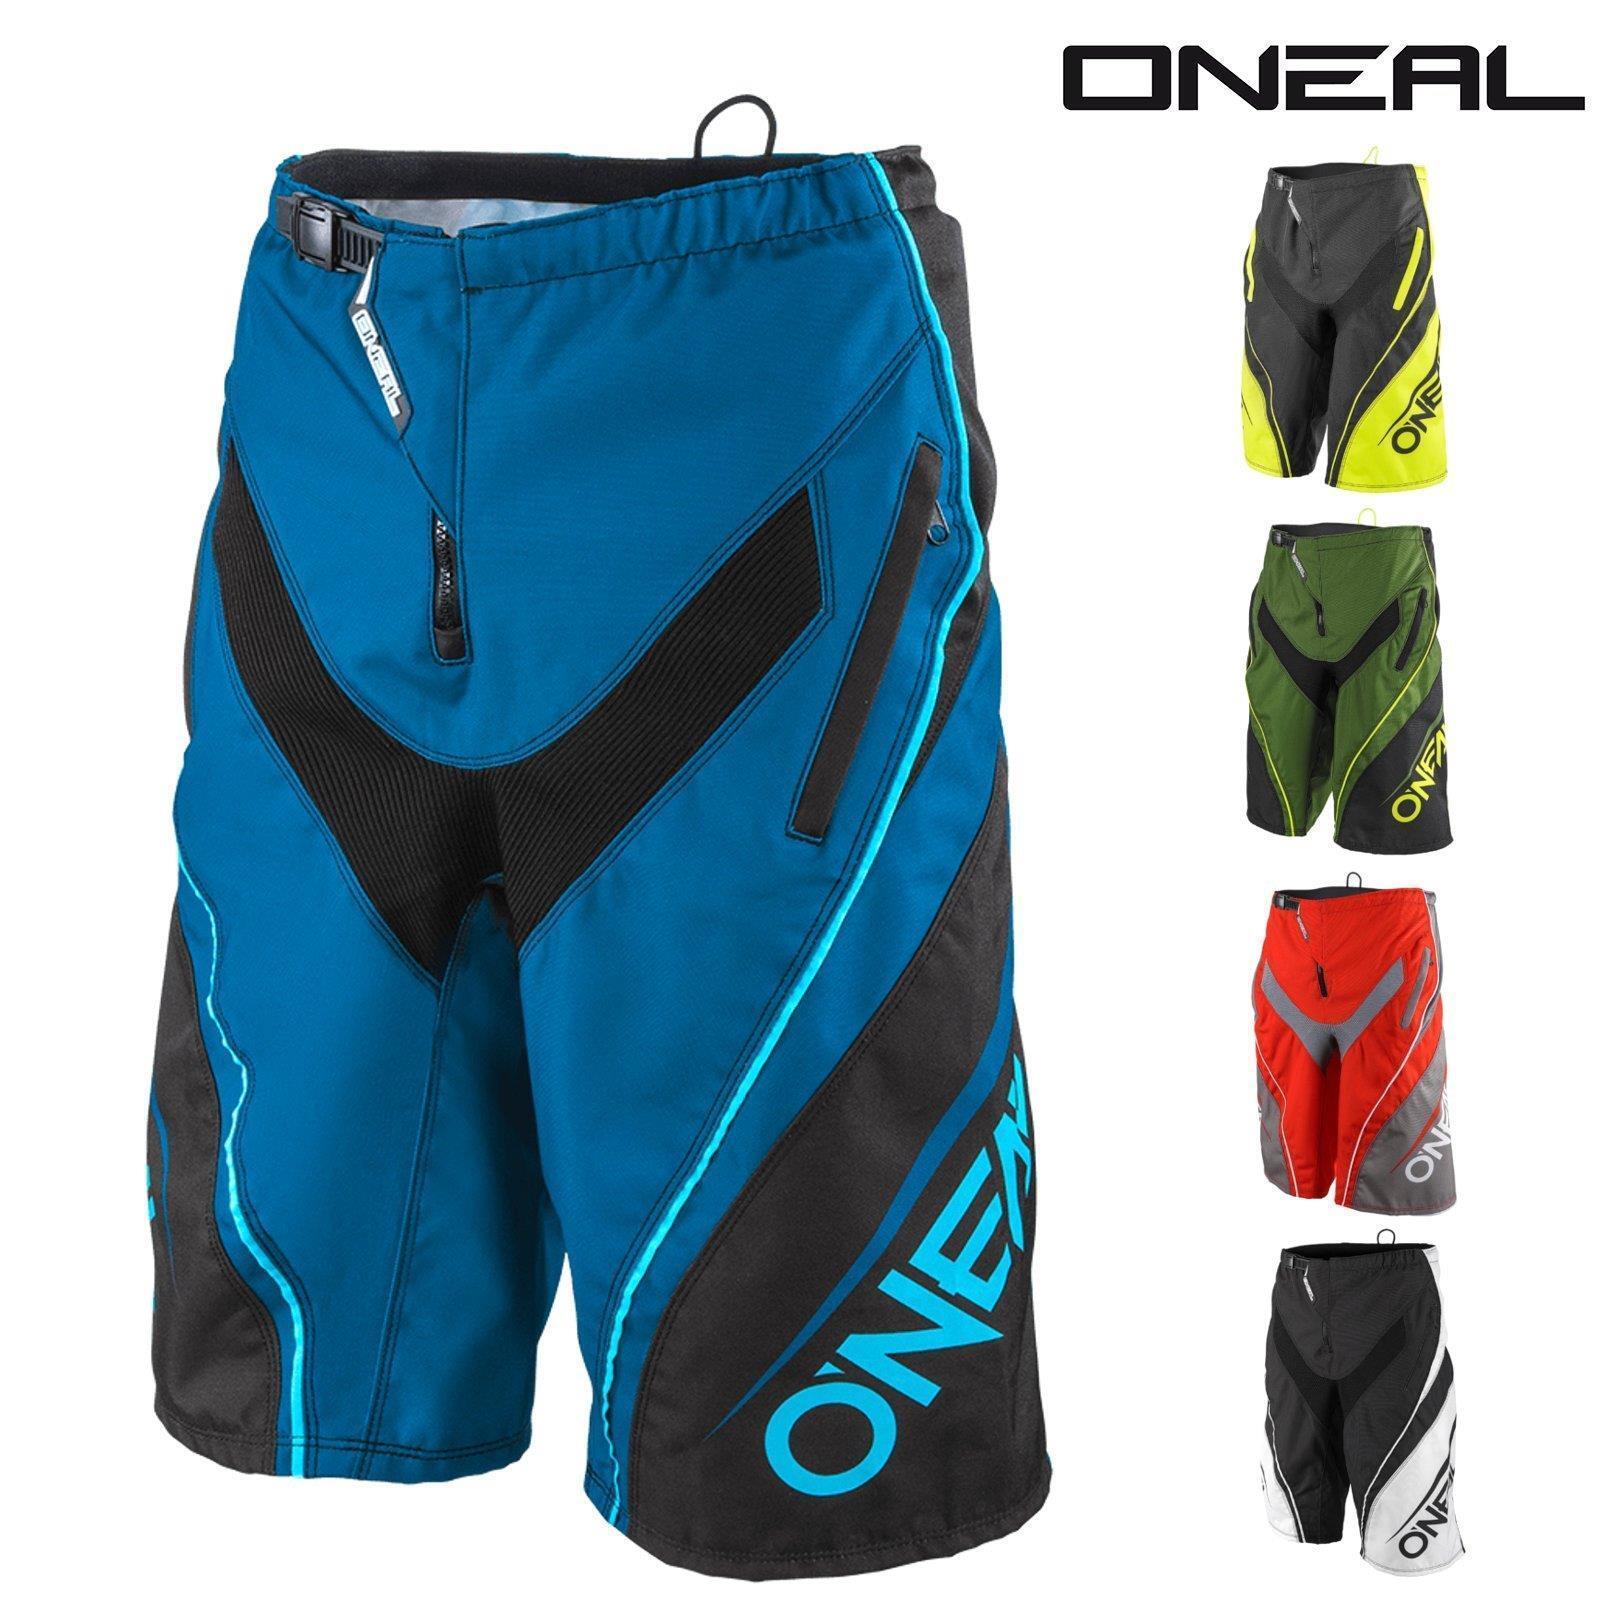 O'Neal Element FR Fahrrad Shorts Kurze Hose DH Downhill Freeride Freeride Downhill Mountain Bike f768b3